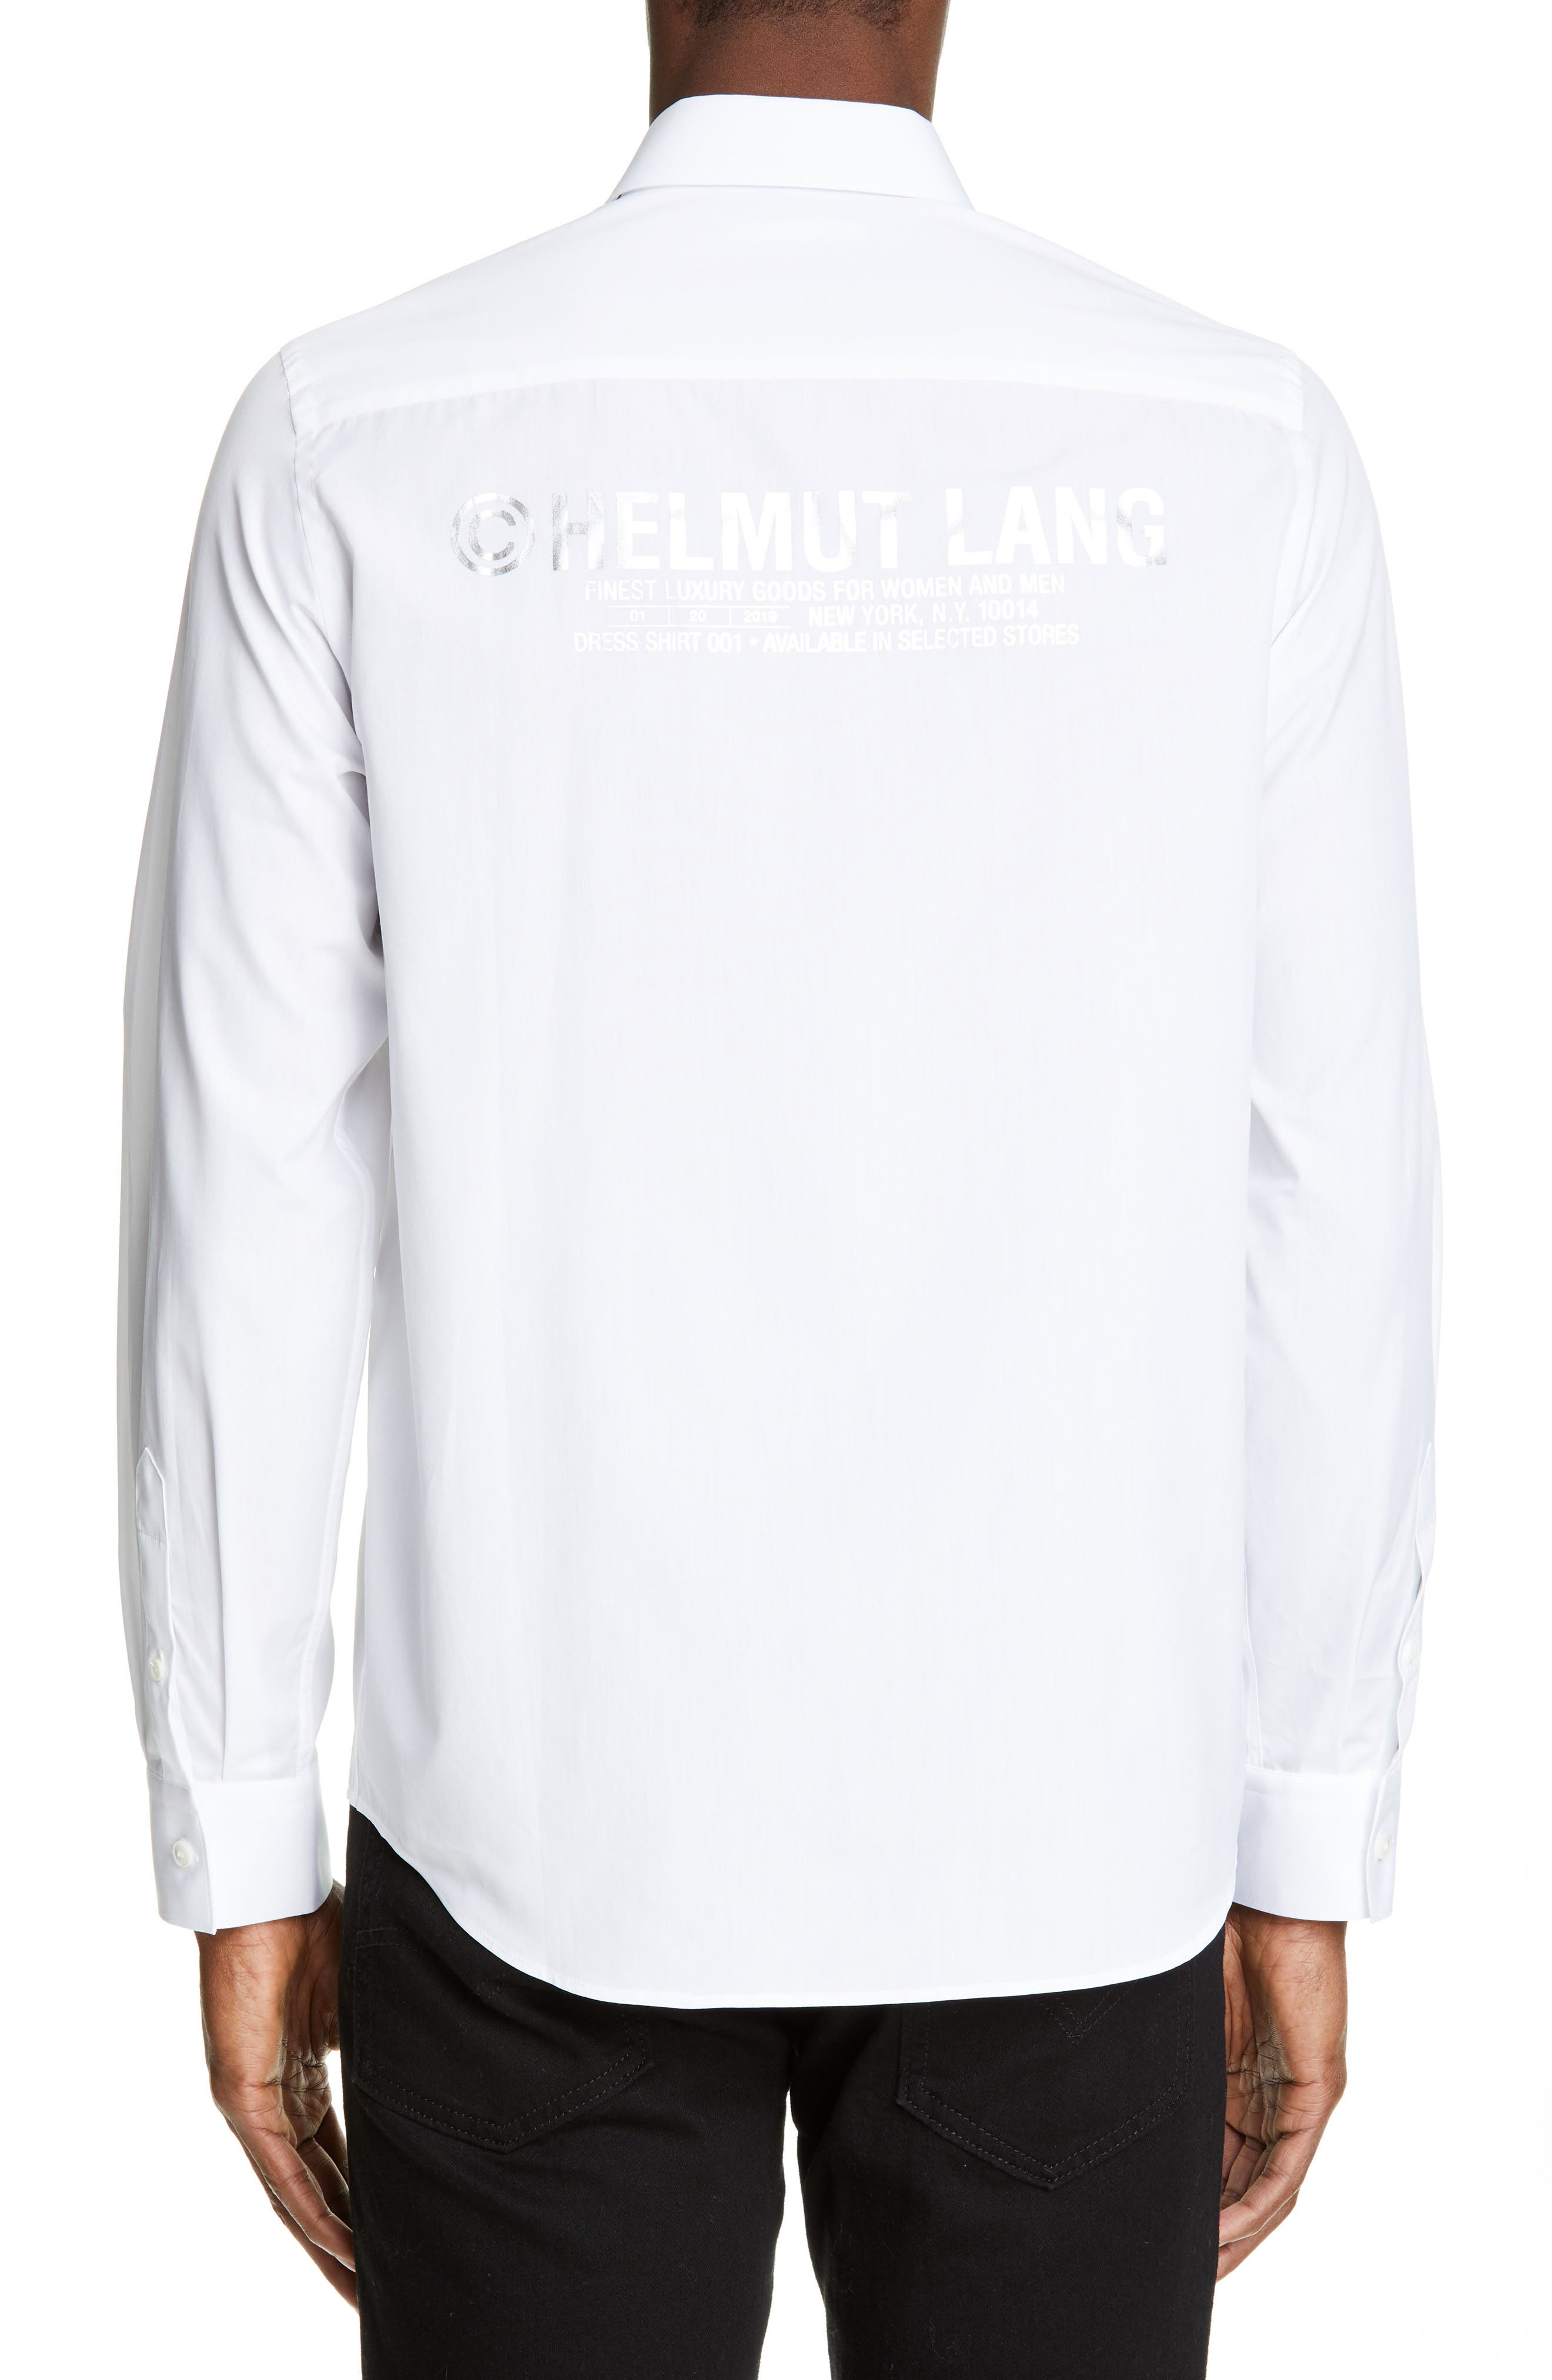 HELMUT LANG, Logo Print Dress Shirt, Alternate thumbnail 3, color, WHITE/SILVER